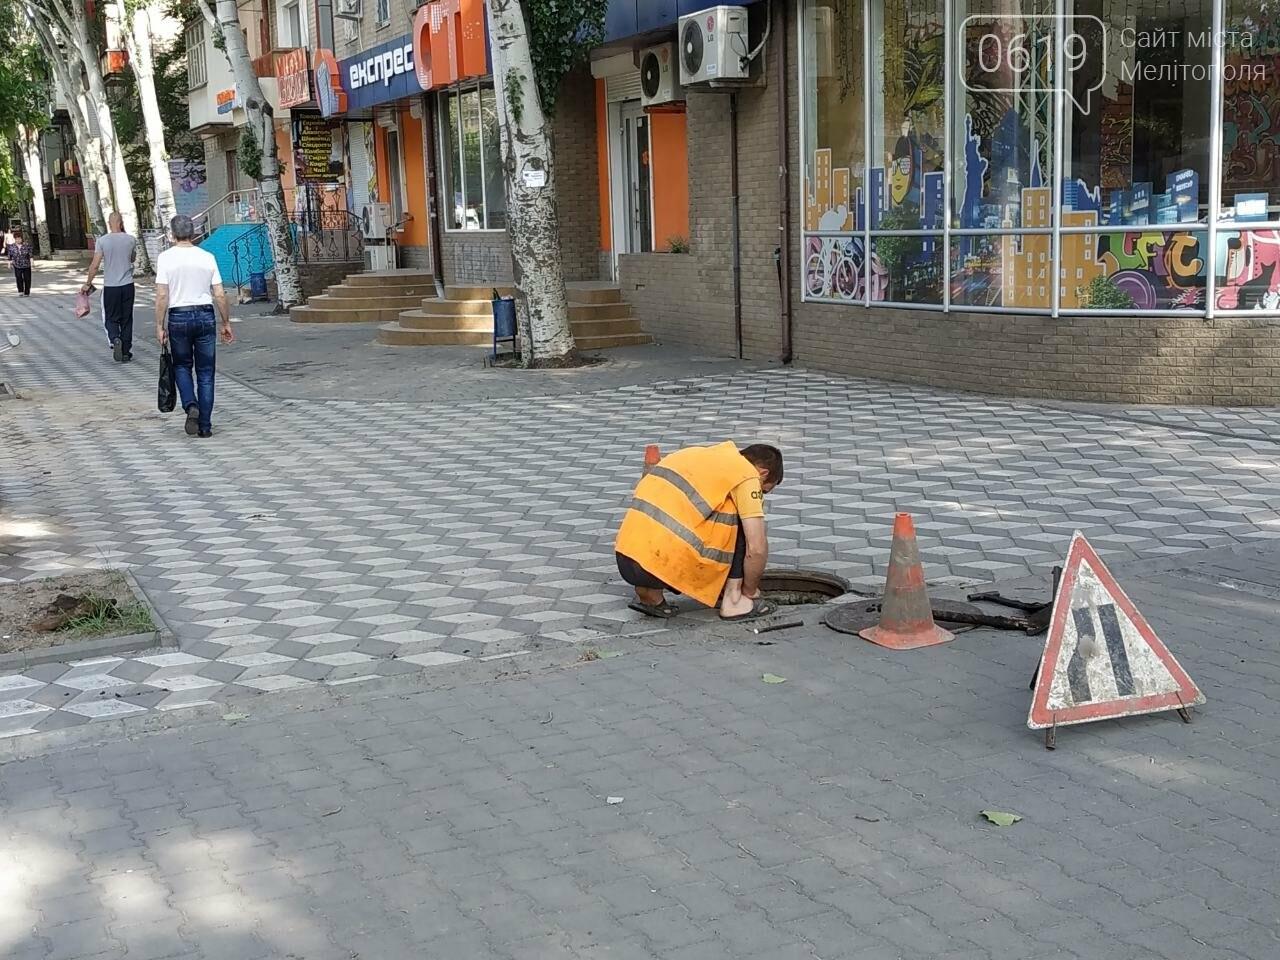 В центре Мелитополя устраняют поломку водопровода , фото-1